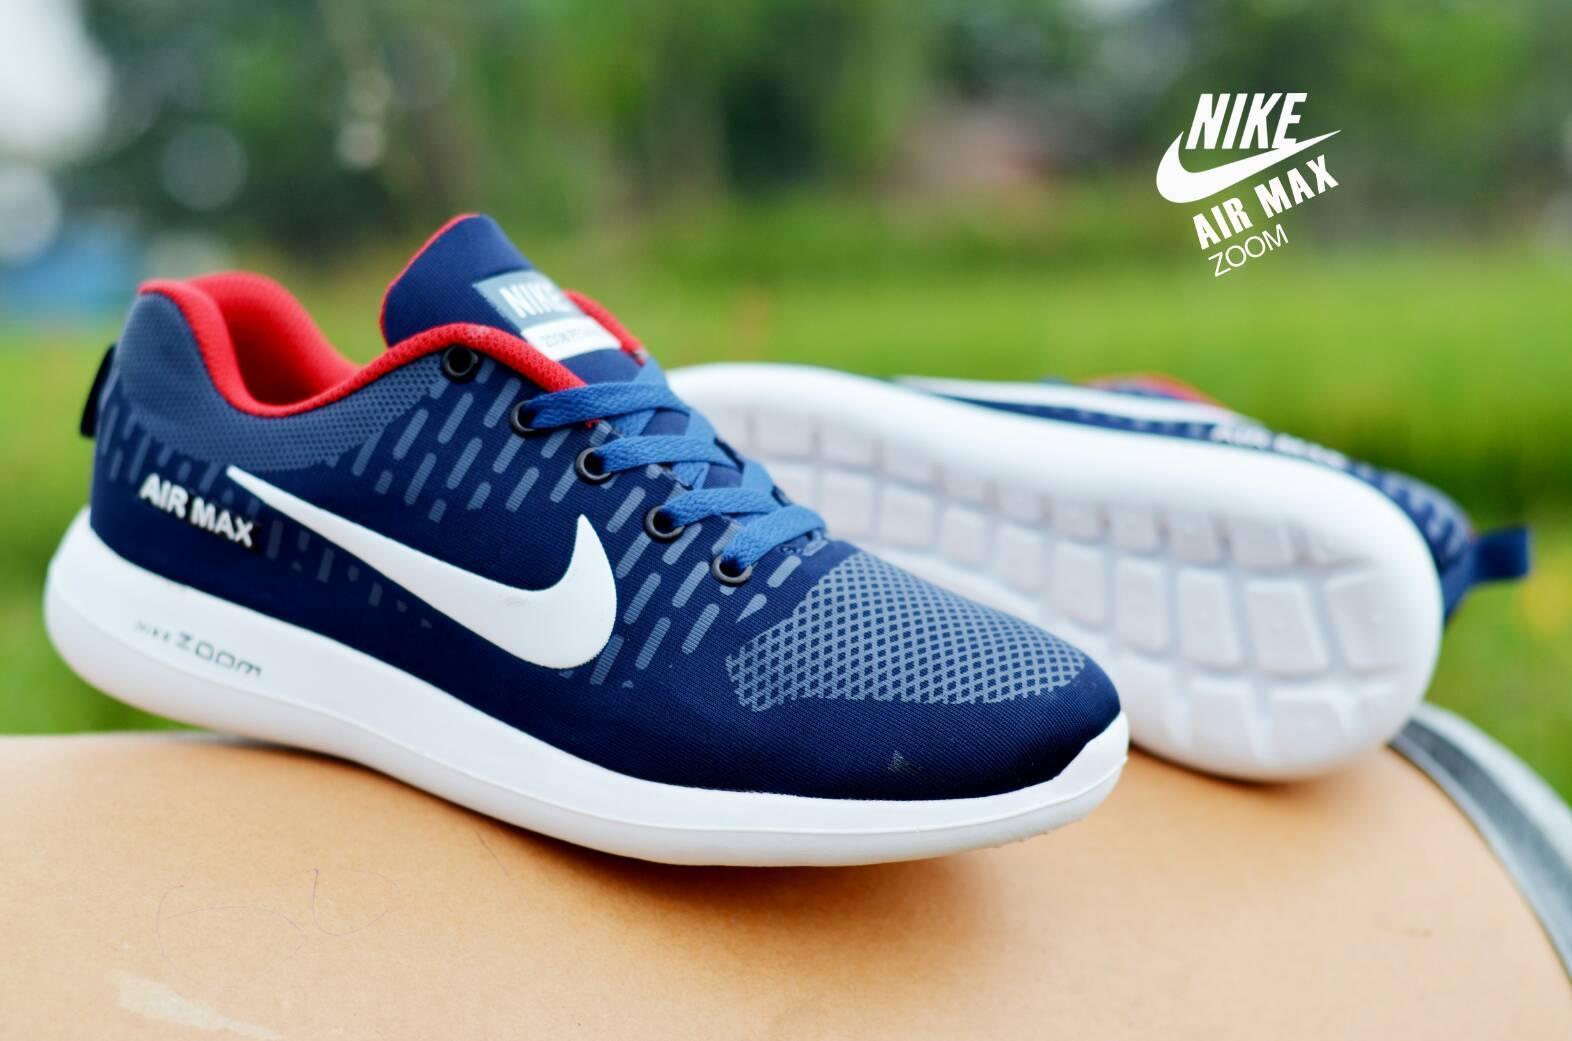 Jual Promo Sepatu Olaharaga Nike Zoom Max Fashion Pria warna navy